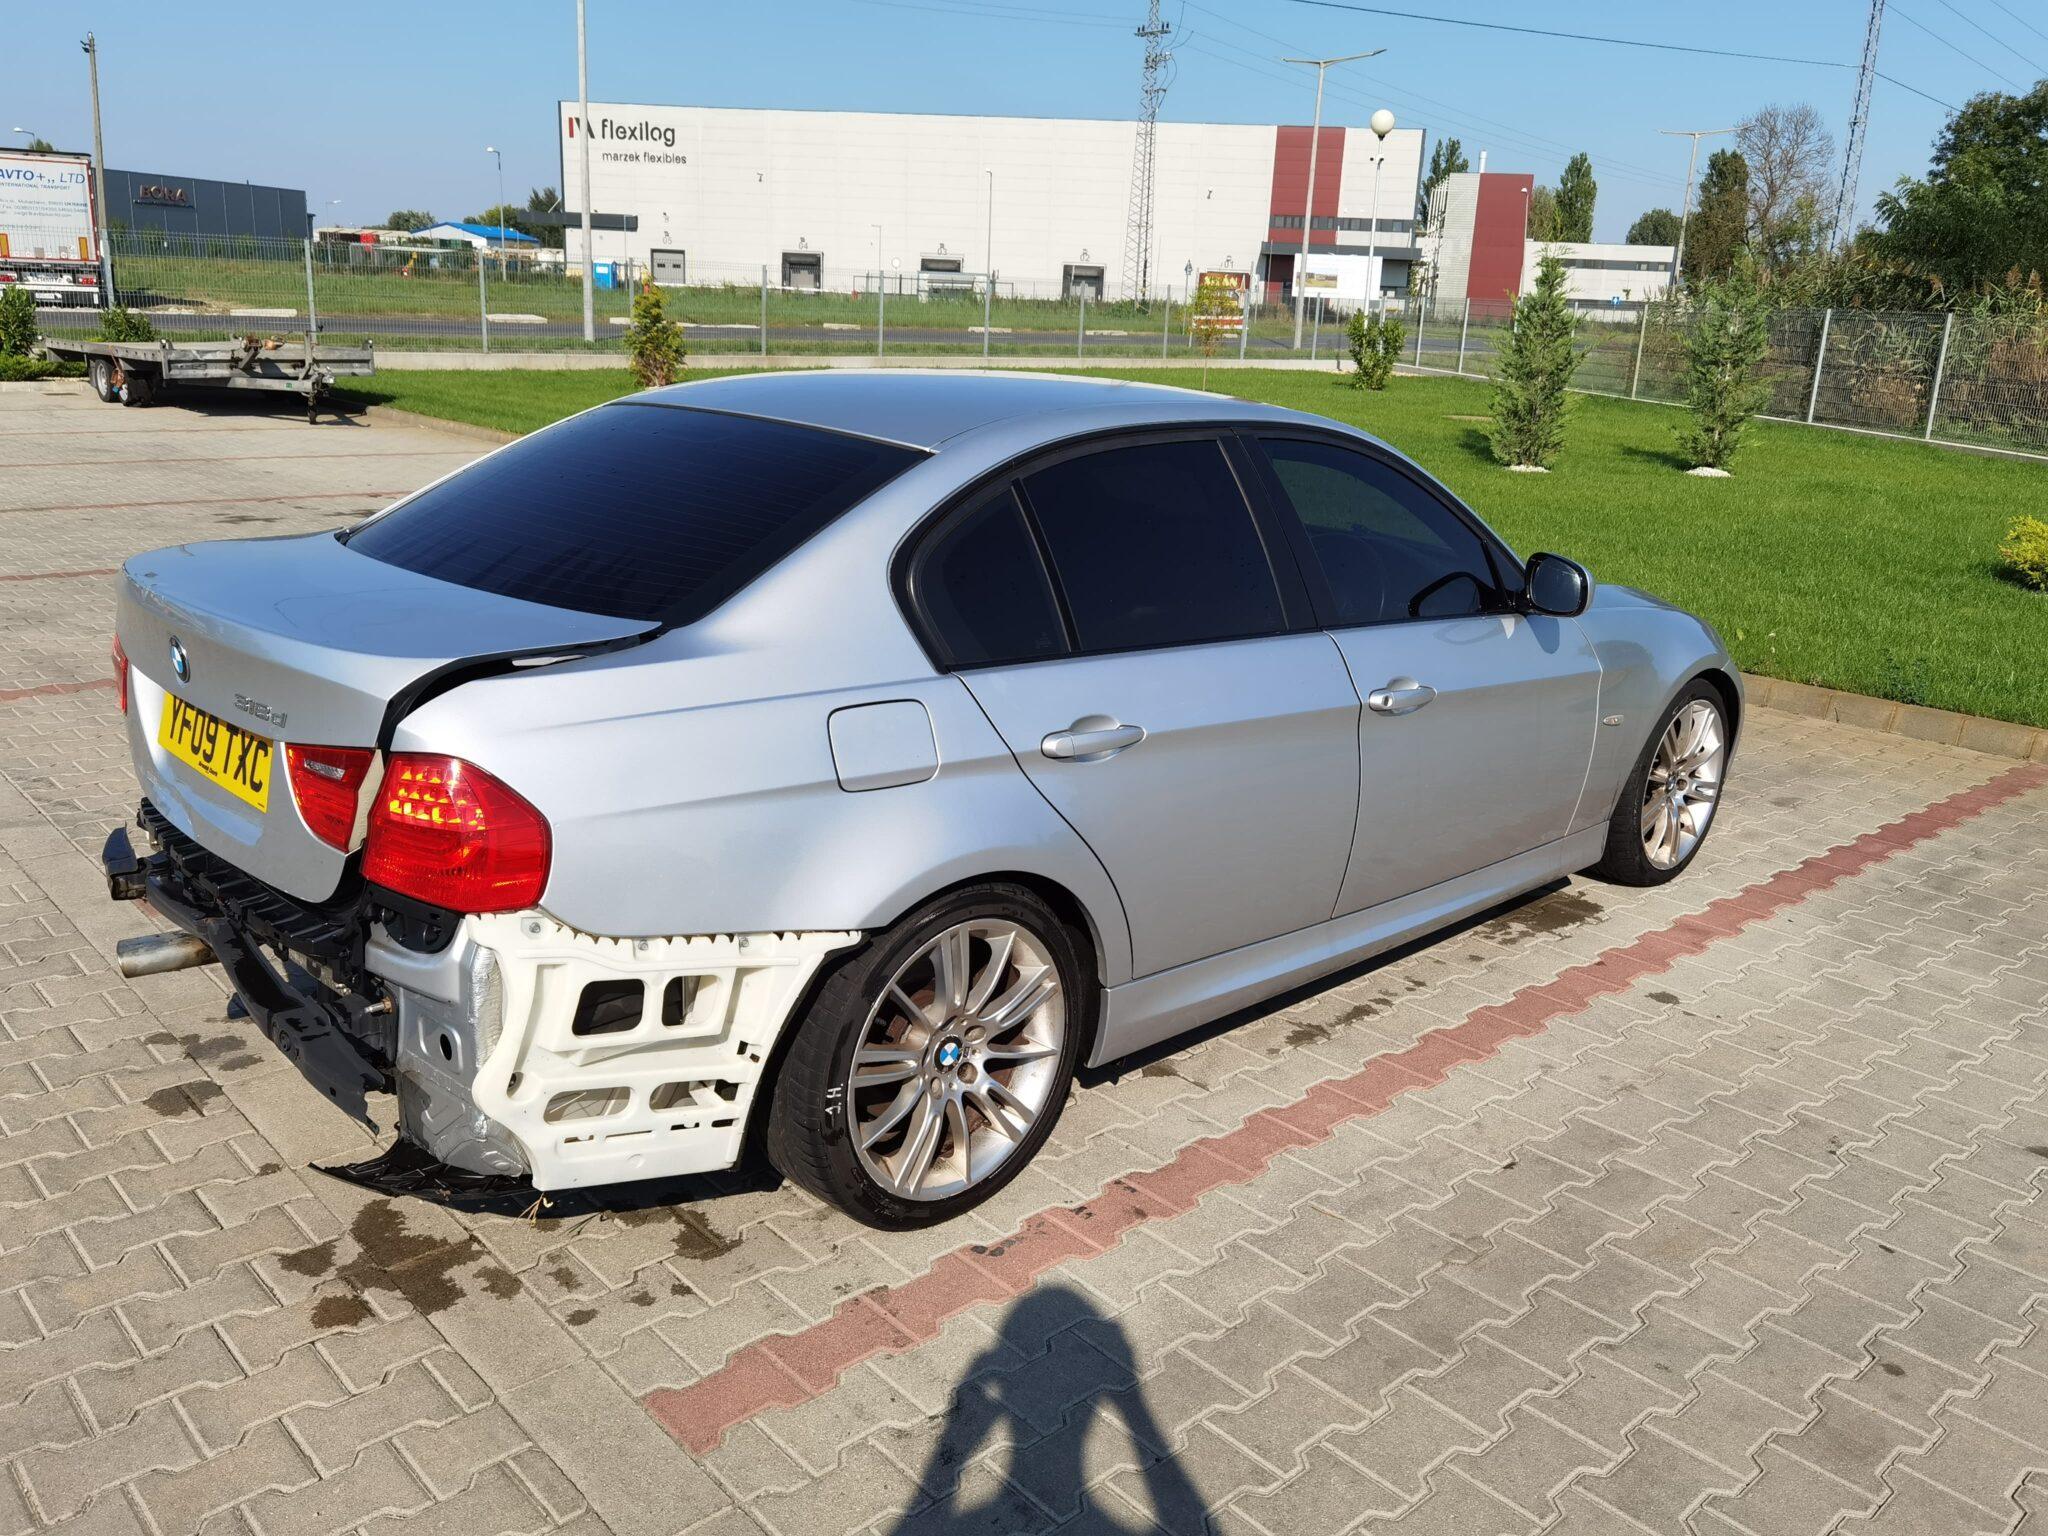 BMW E90 lci 318d Carbon Car Center Békéscsaba-8